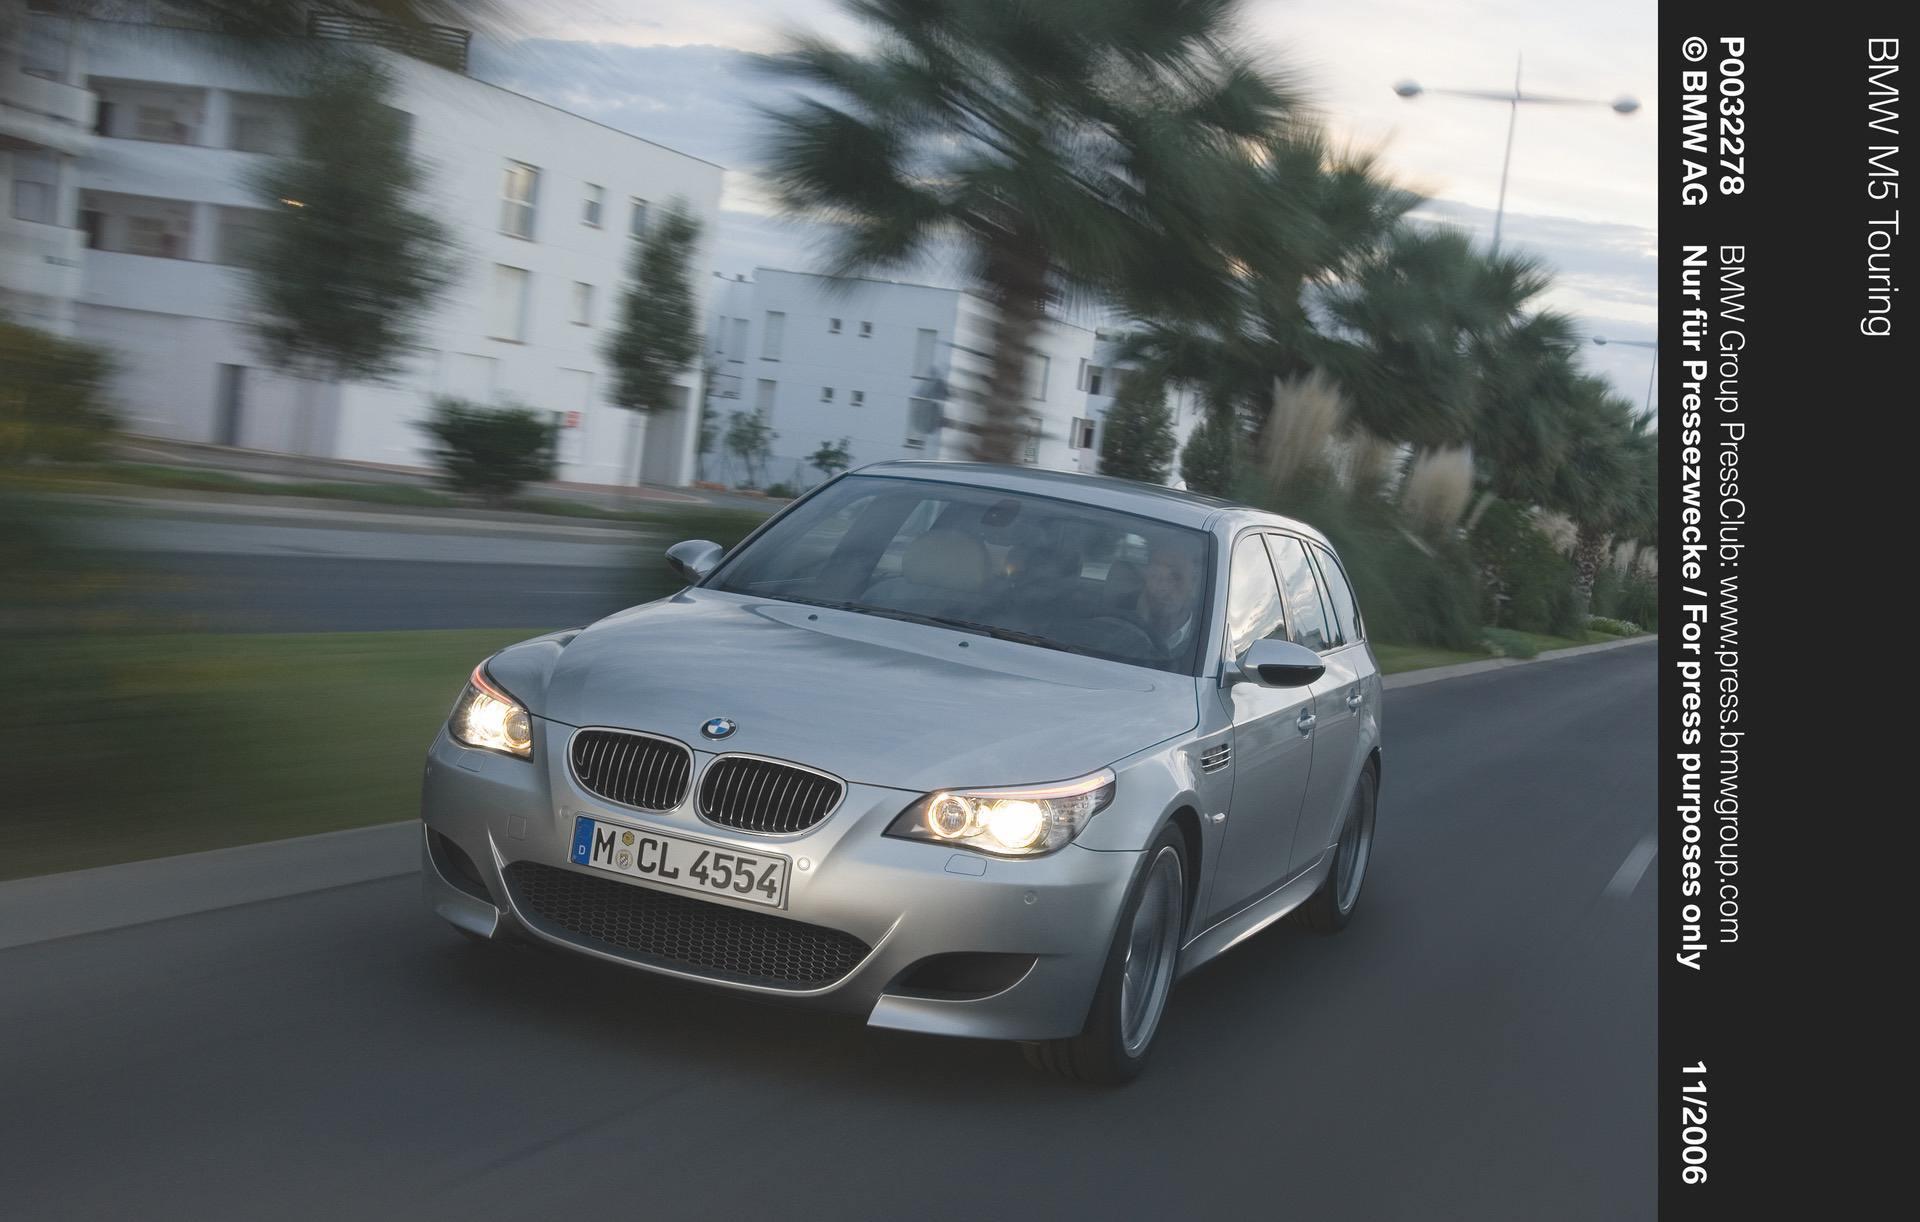 BMW E61 M5 Touring 12